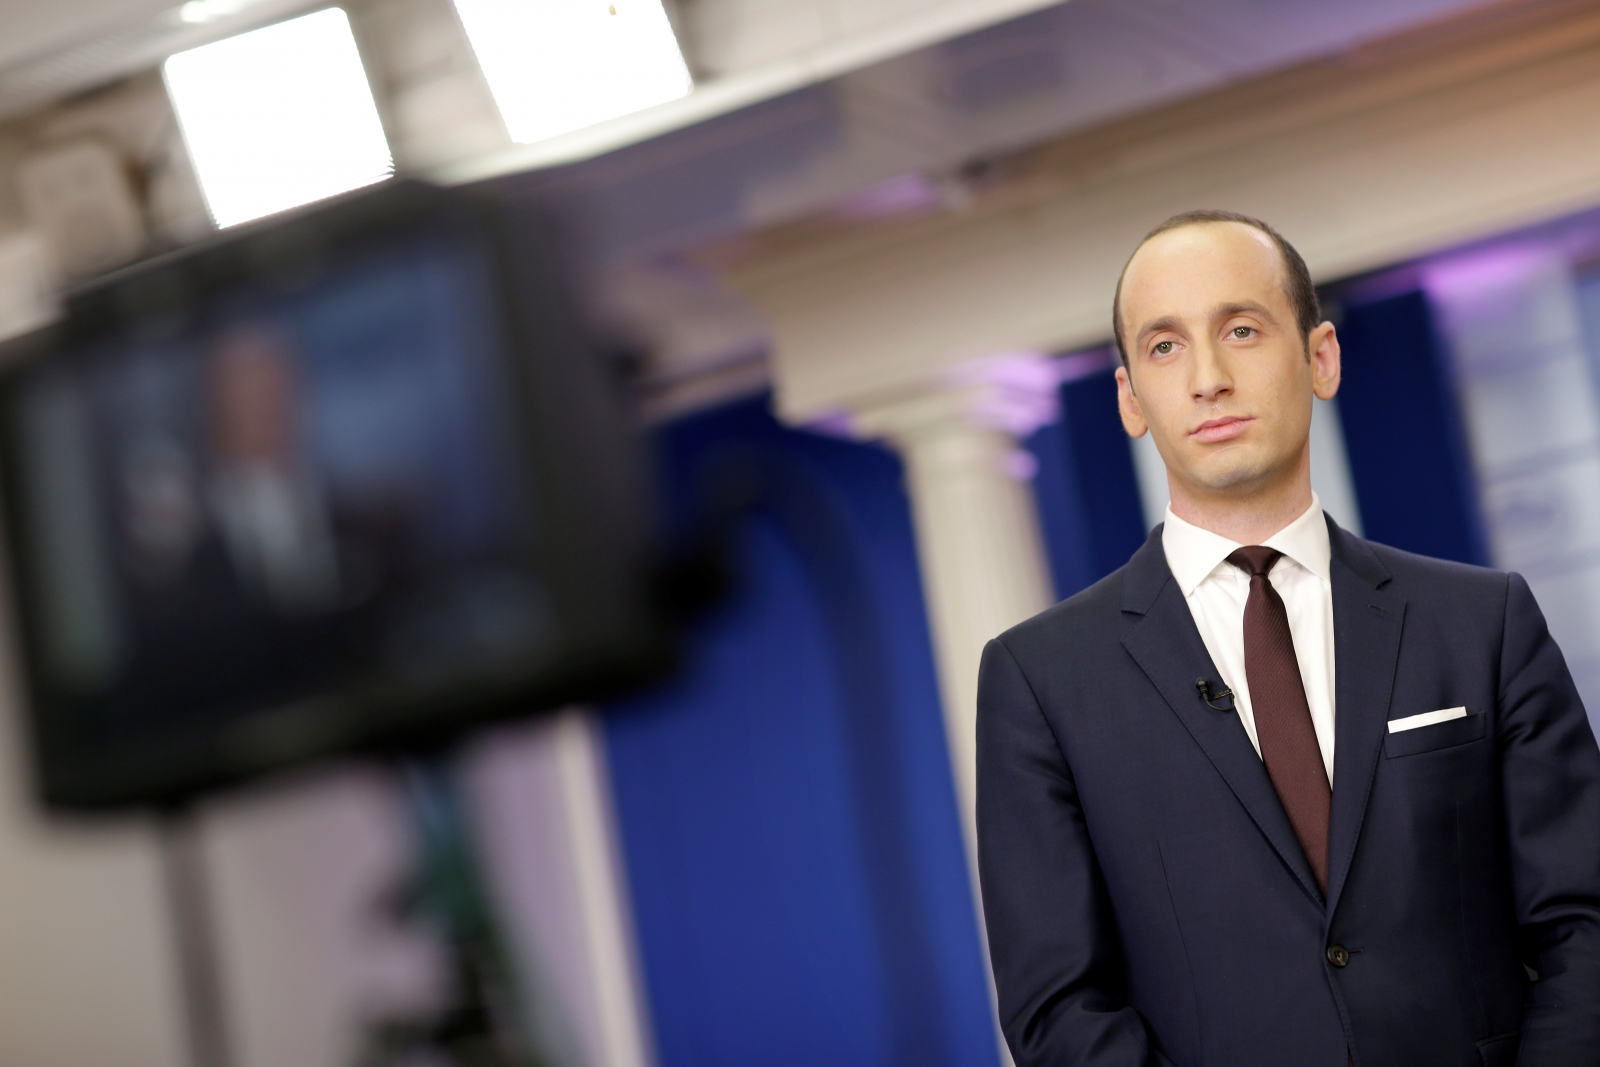 Stephen Miller in the briefing room